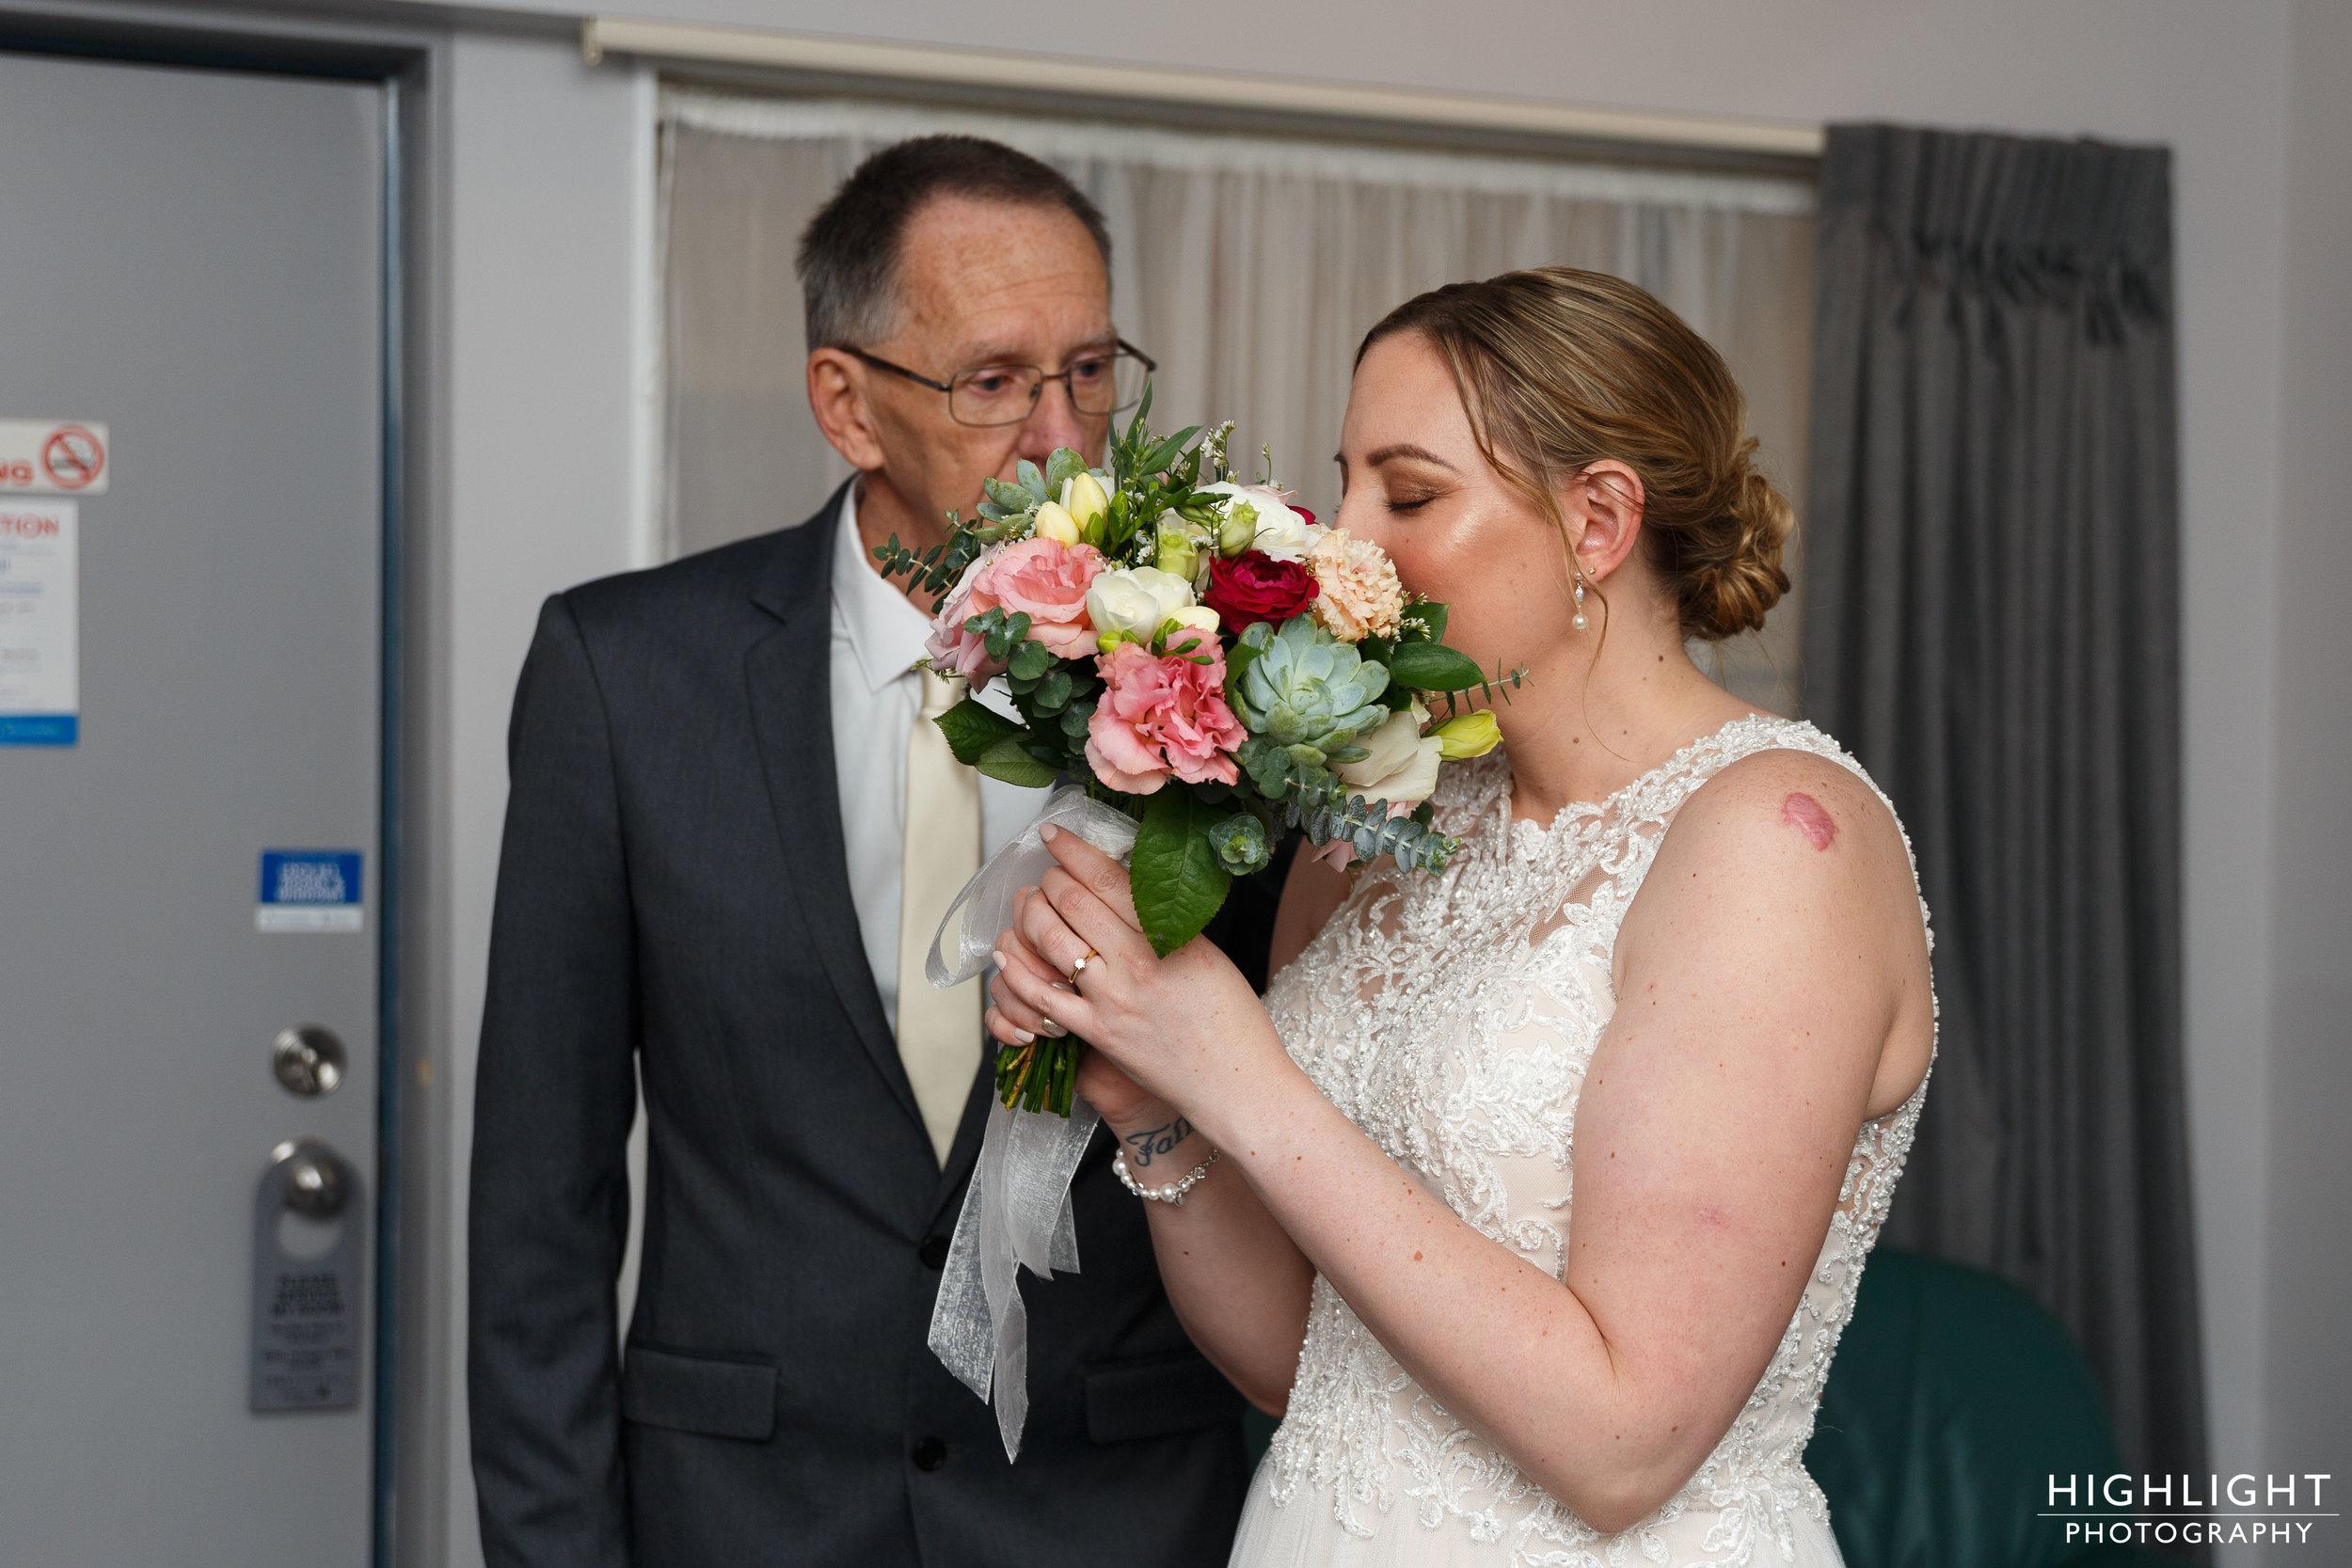 highlight-wedding-photography-palmerston-north-new-zealand-manawatu-chalet-27.jpg